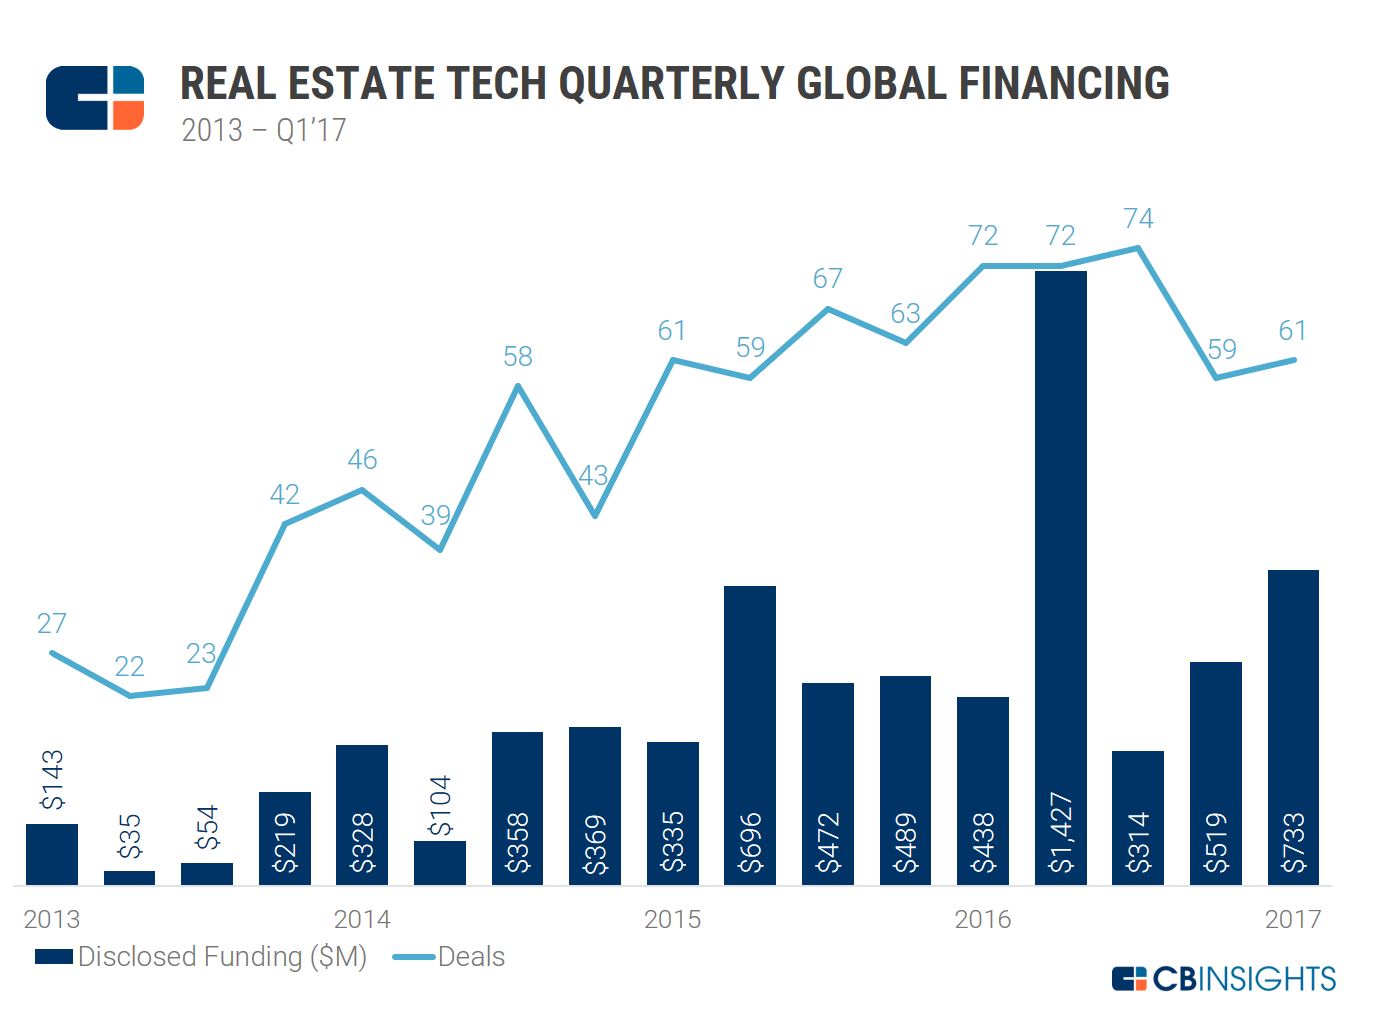 RE Tech Qaurterly Funding 2013-Q1'17